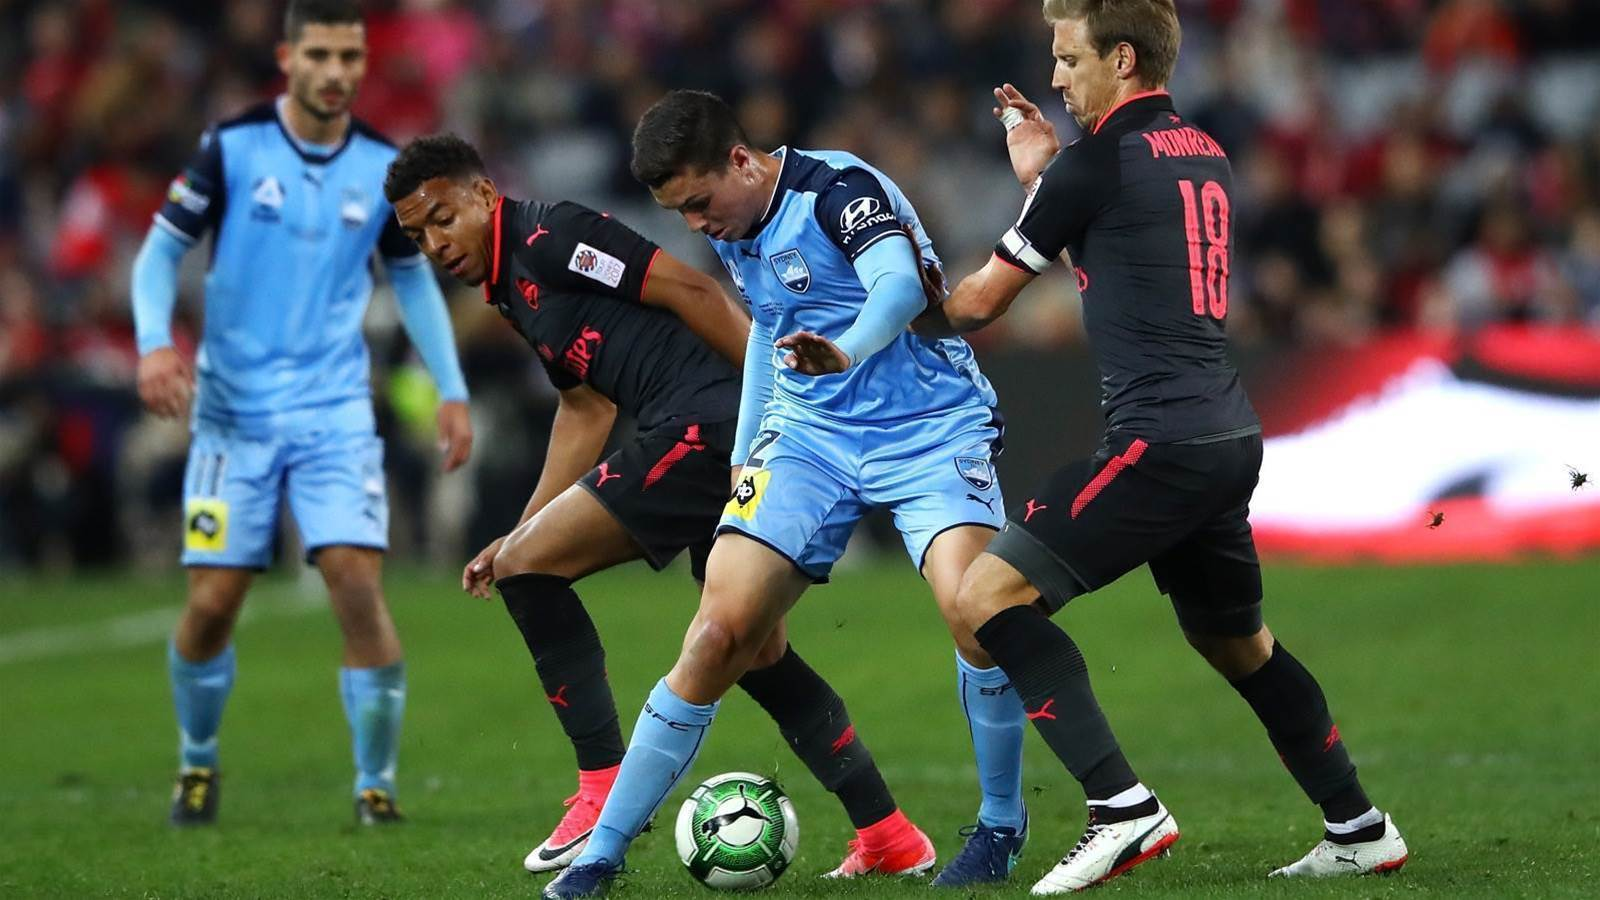 Aussie striker out for five months